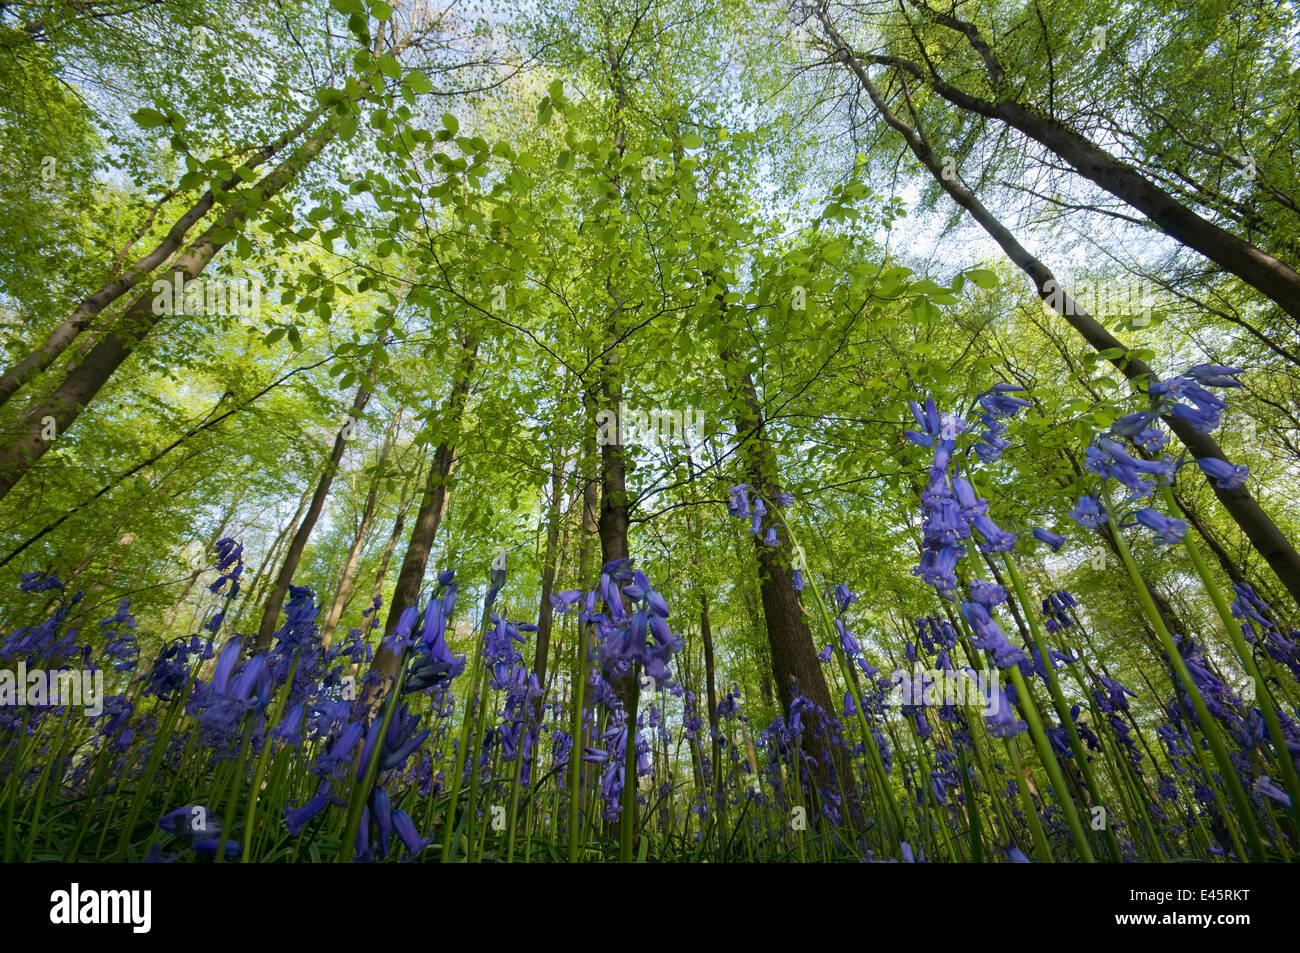 Bluebells (Hyacinthoides non-scripta / Endymion scriptum) flowering in beech wood, Hallerbos, Belgium, April, low - Stock Image